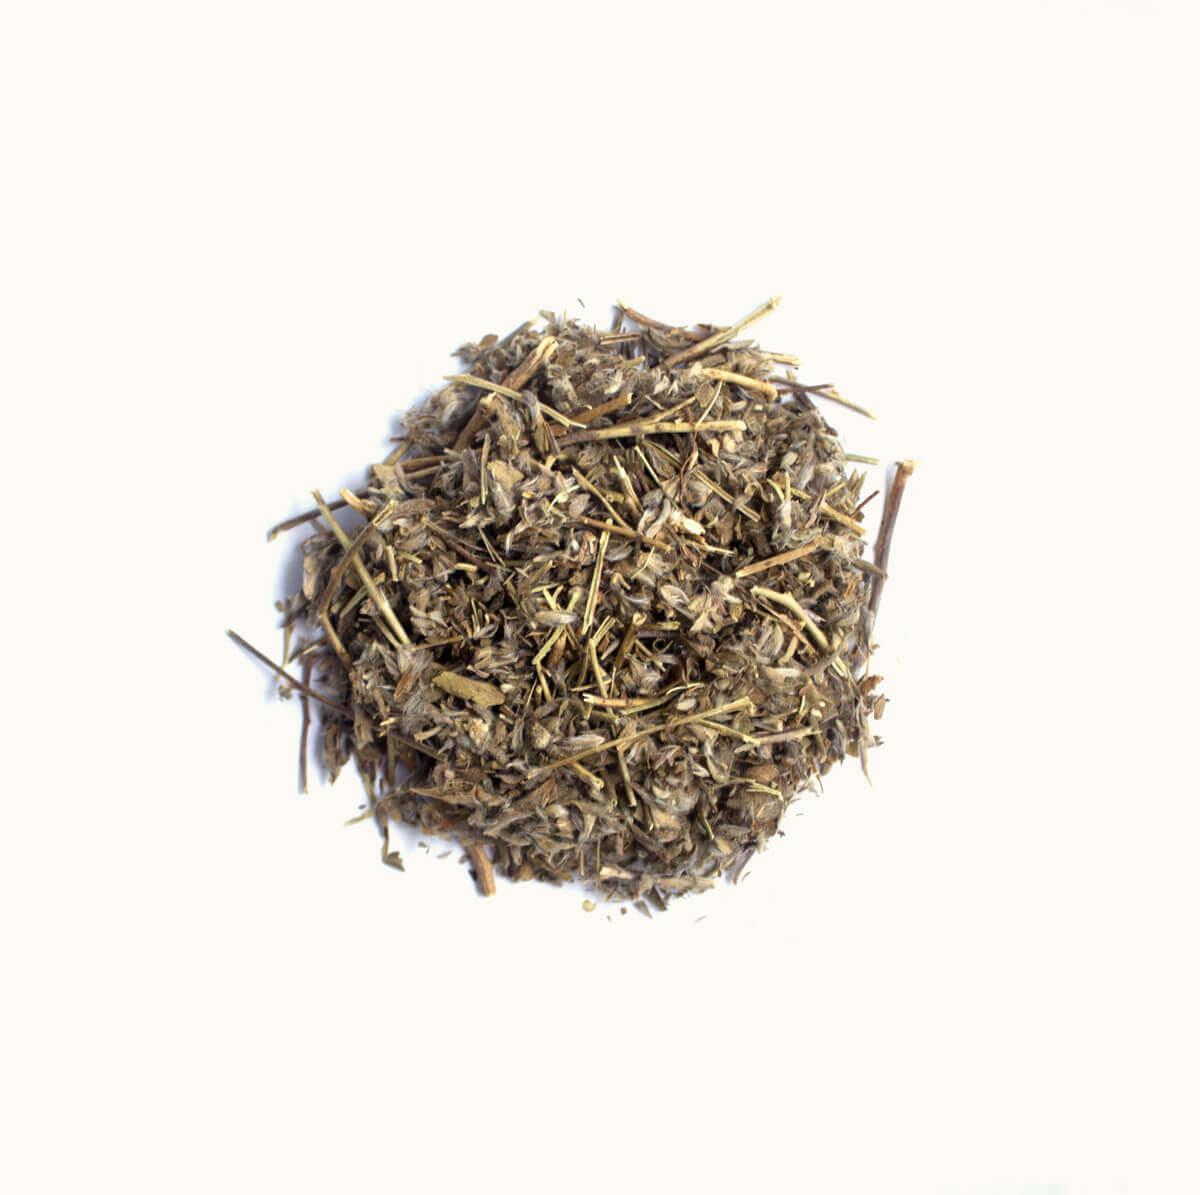 SETE SANGRIAS - Cuphea spp - 30g